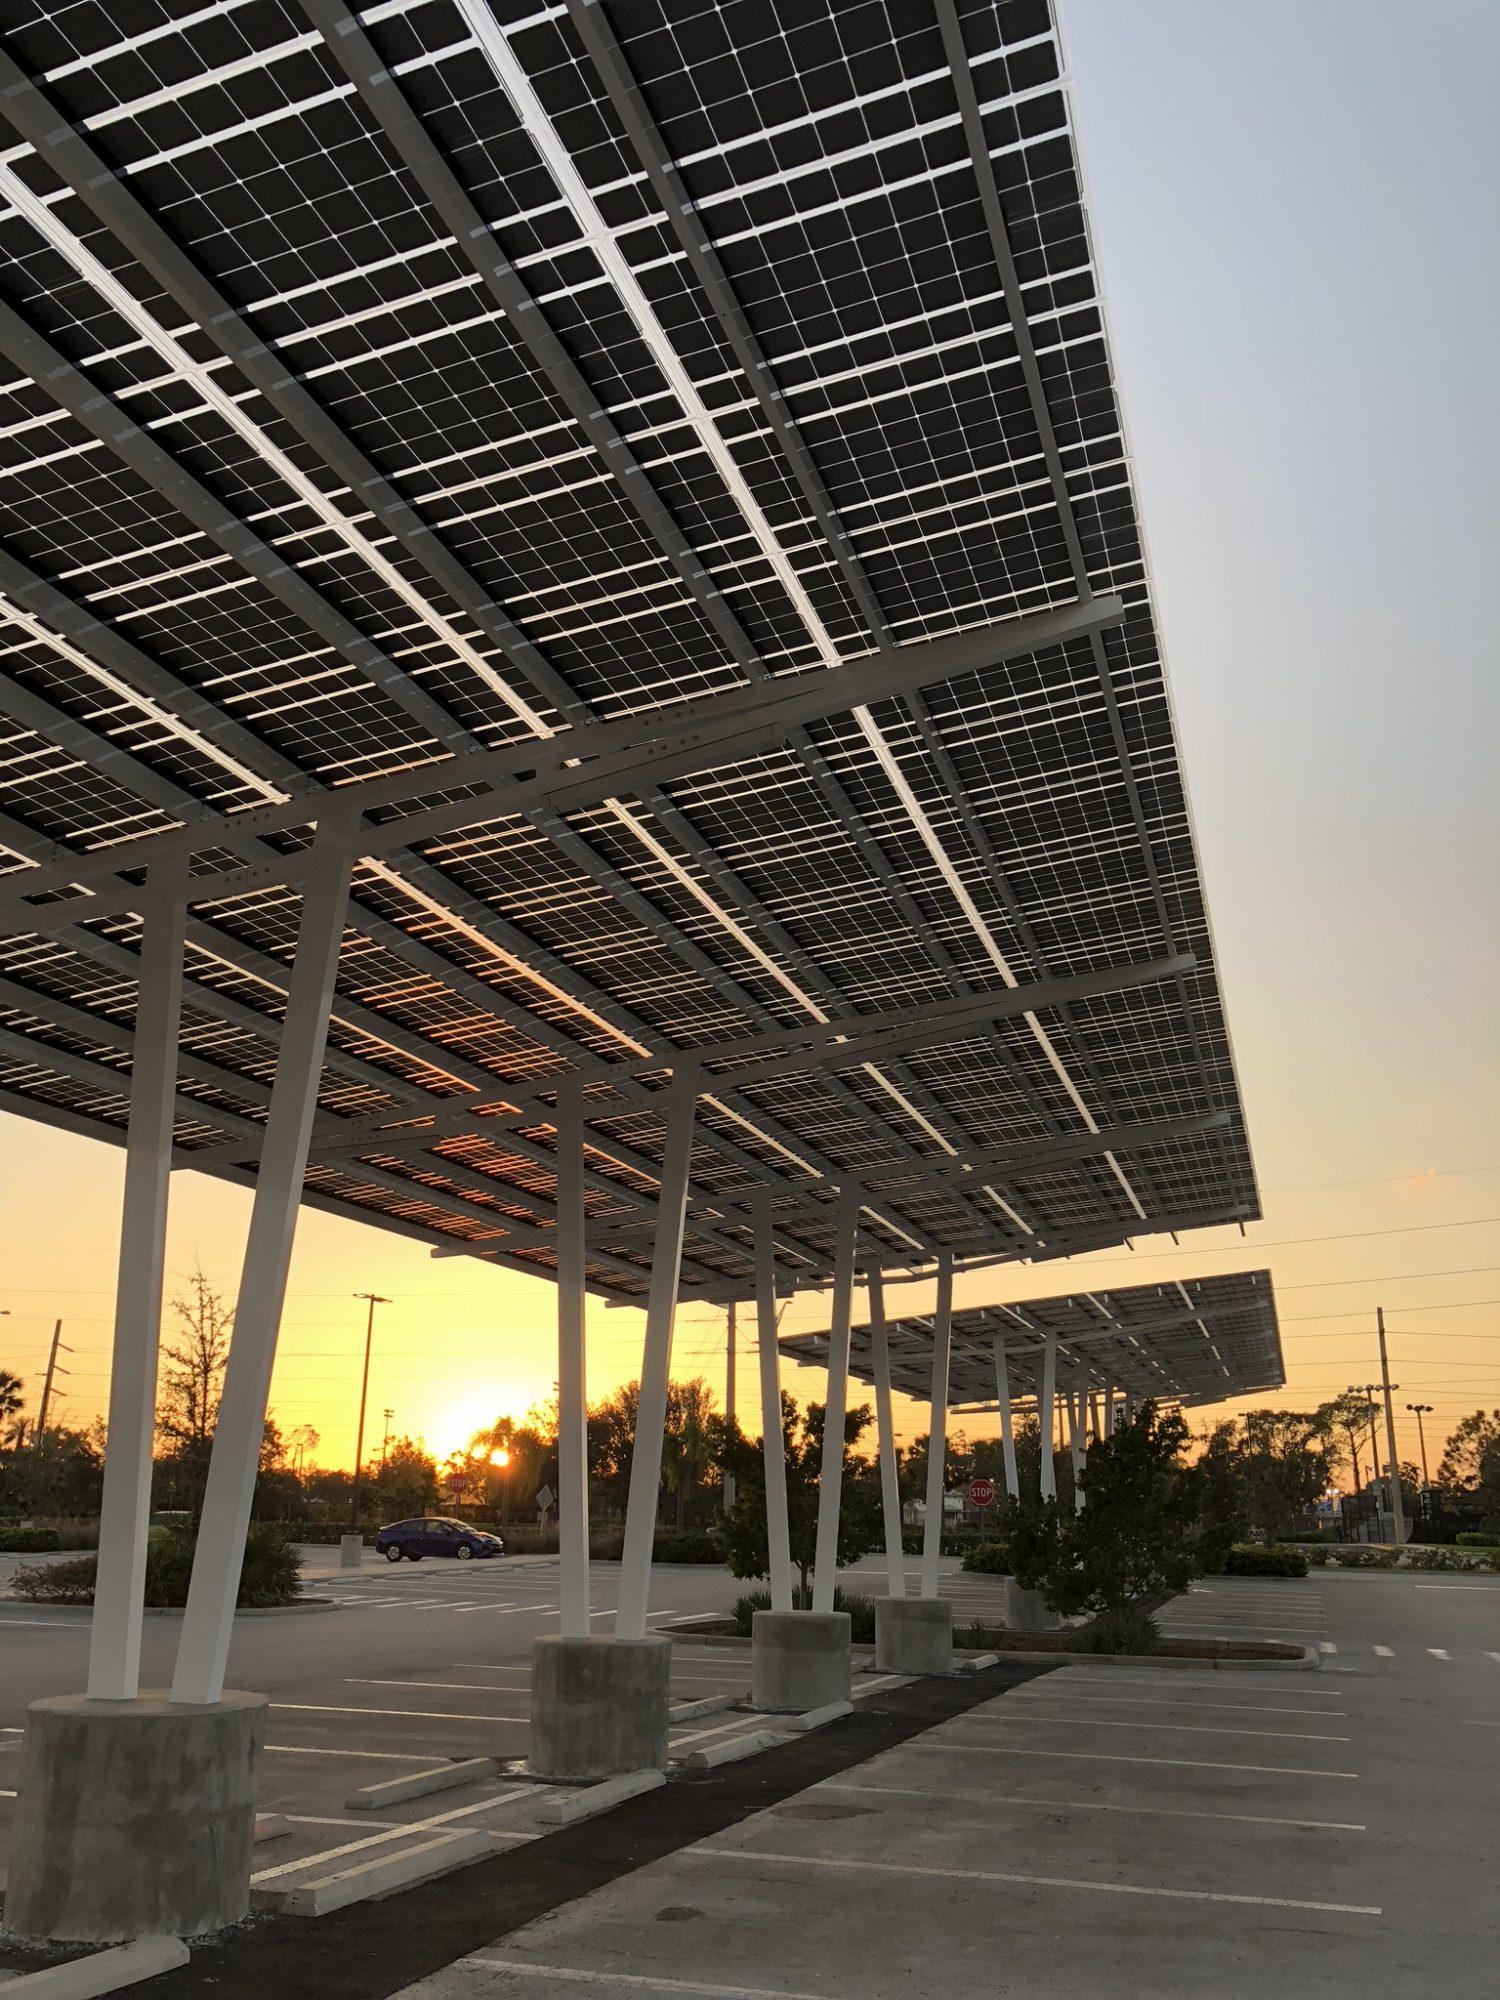 https://universalkraft.com/wp-content/uploads/2020/11/solar-parking-vertical-universal-kraft.jpg